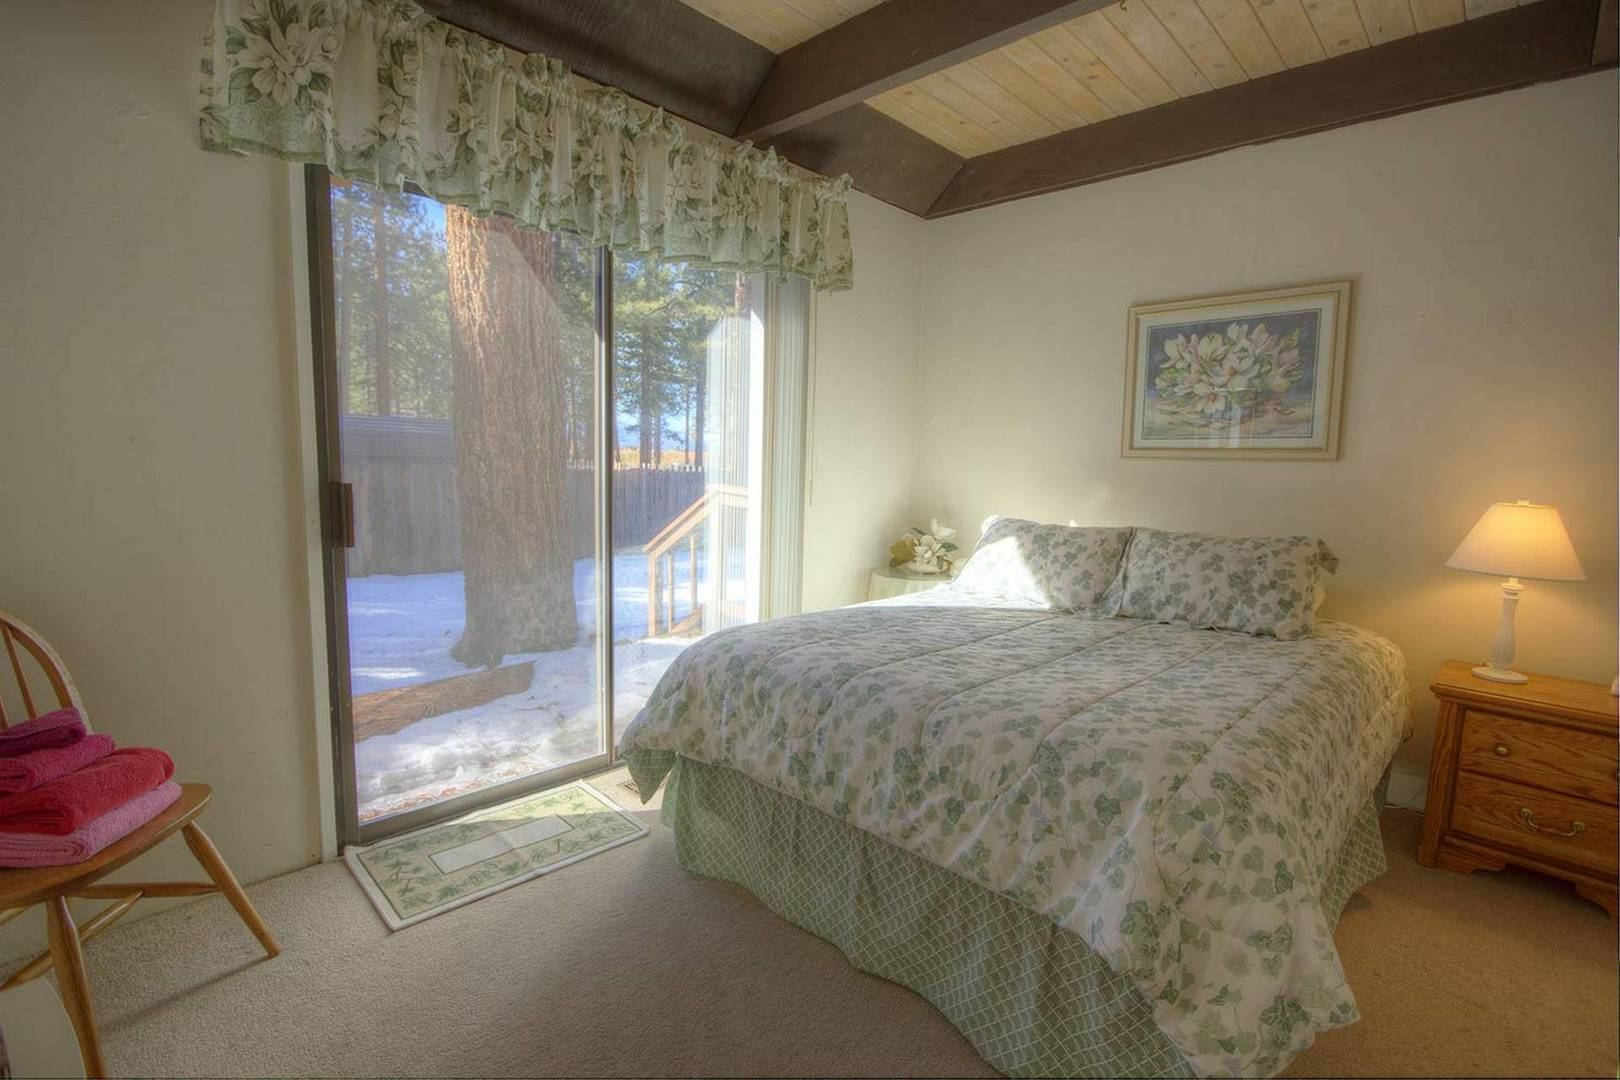 cyh1013 bedroom